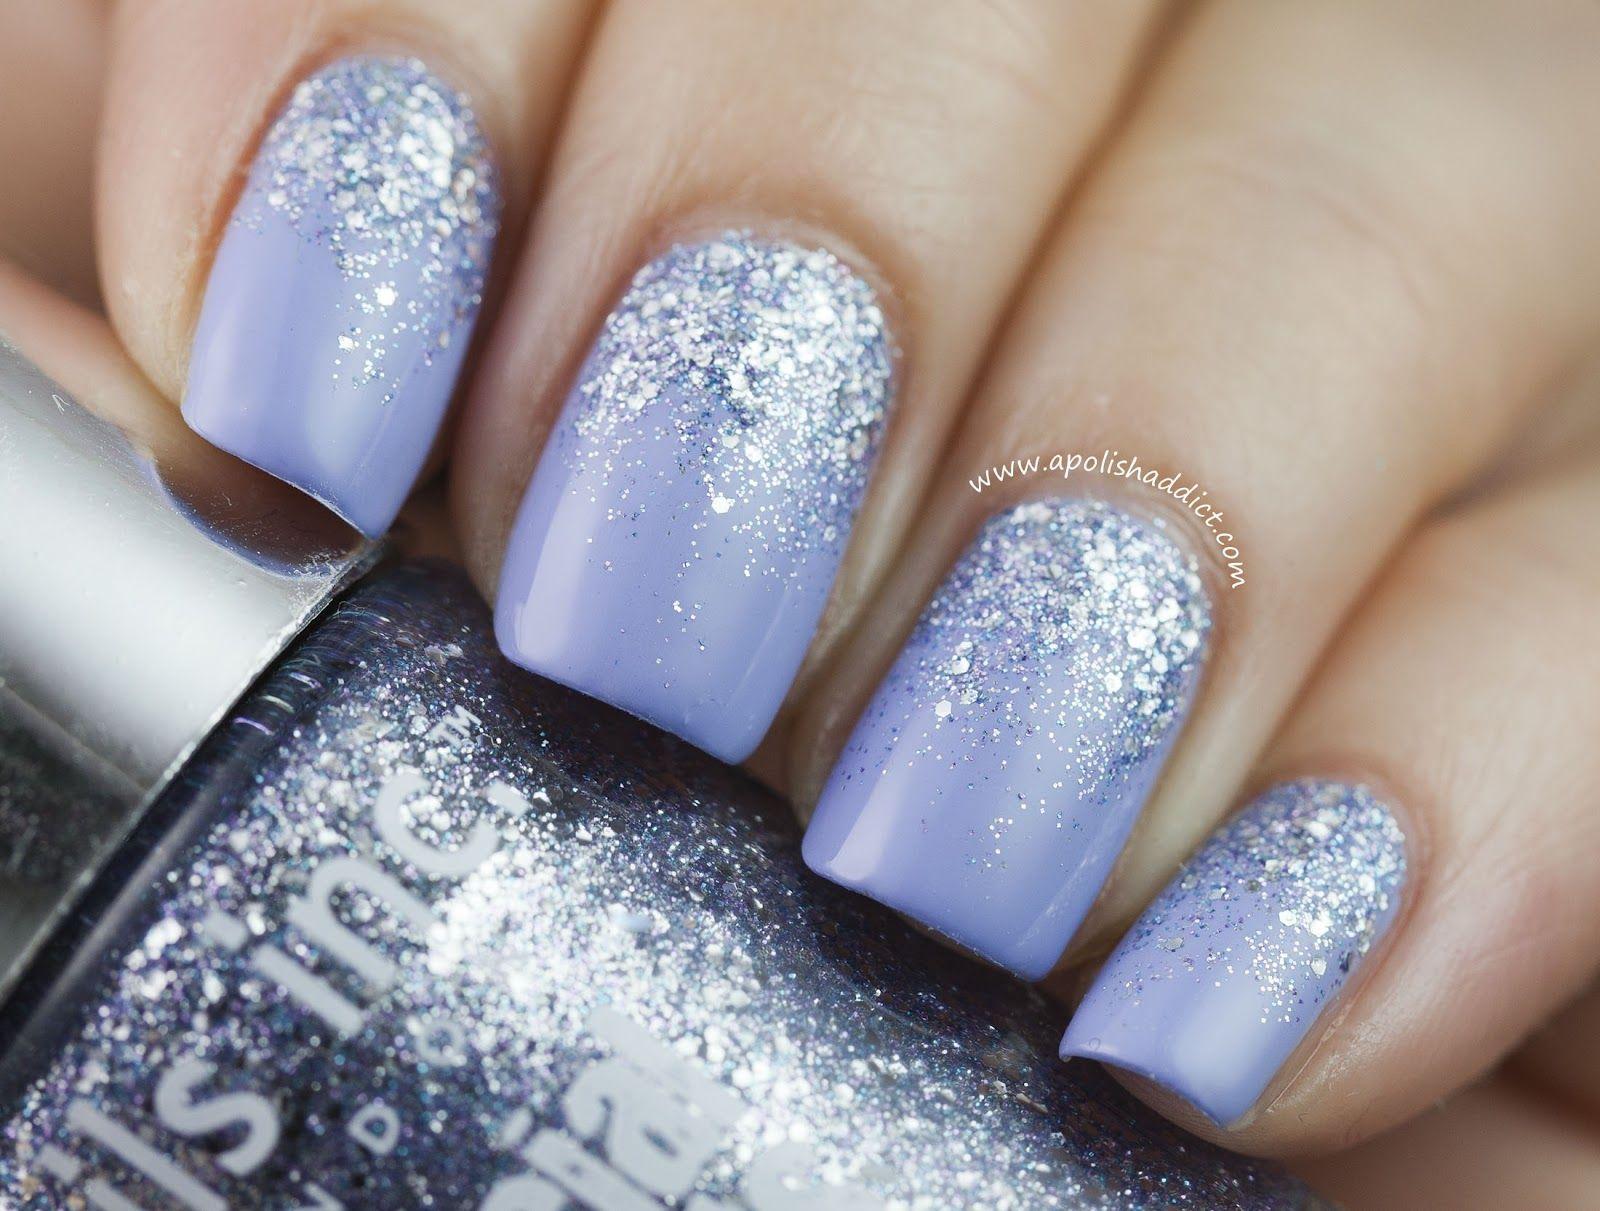 Glitter Nails - Nail Designs Ideas   Nail Art   Pinterest ...